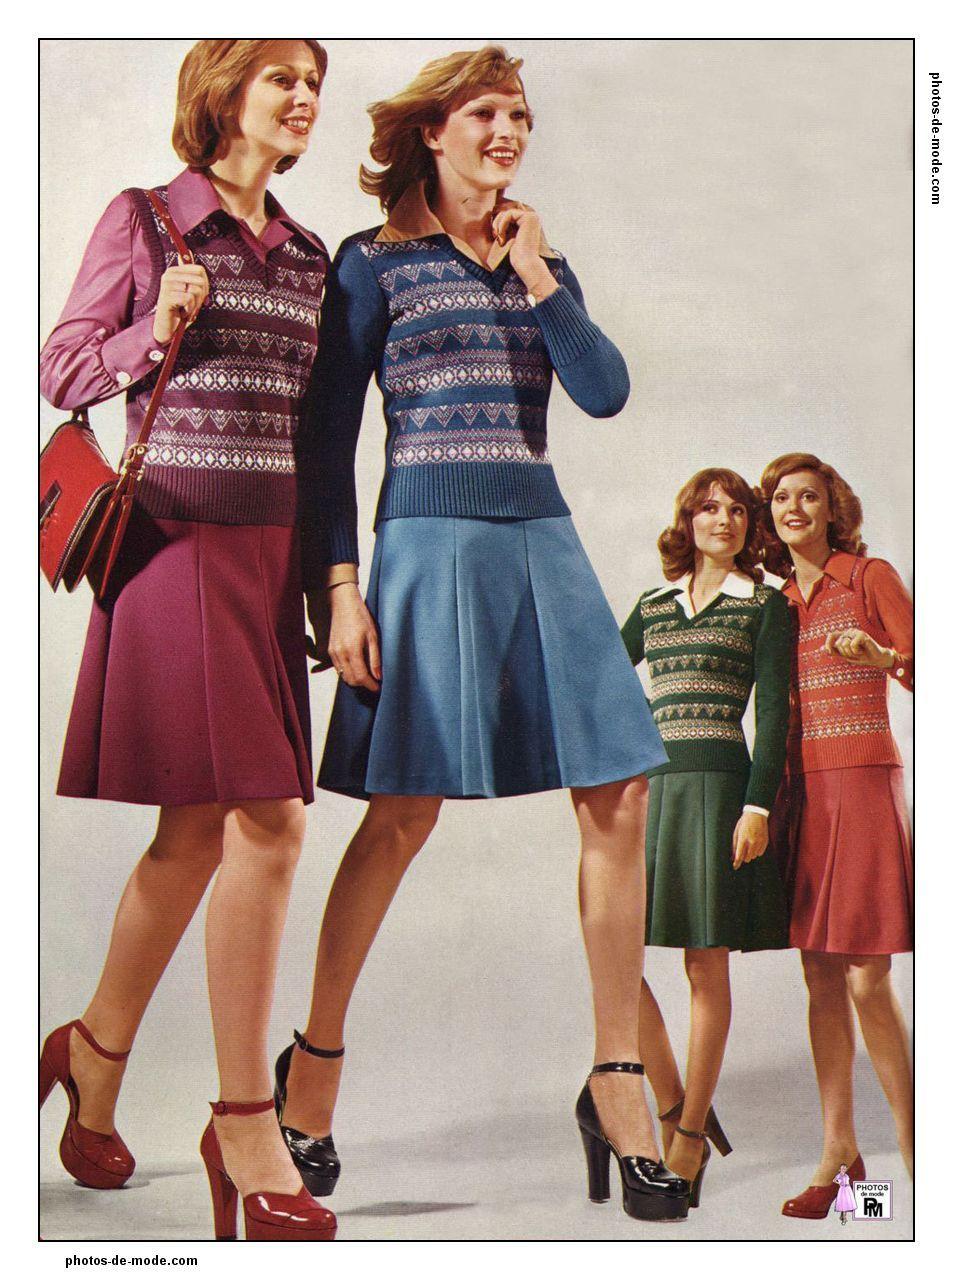 mini jupe 1974 70 39 s fashion 70s fashion et 70s women. Black Bedroom Furniture Sets. Home Design Ideas